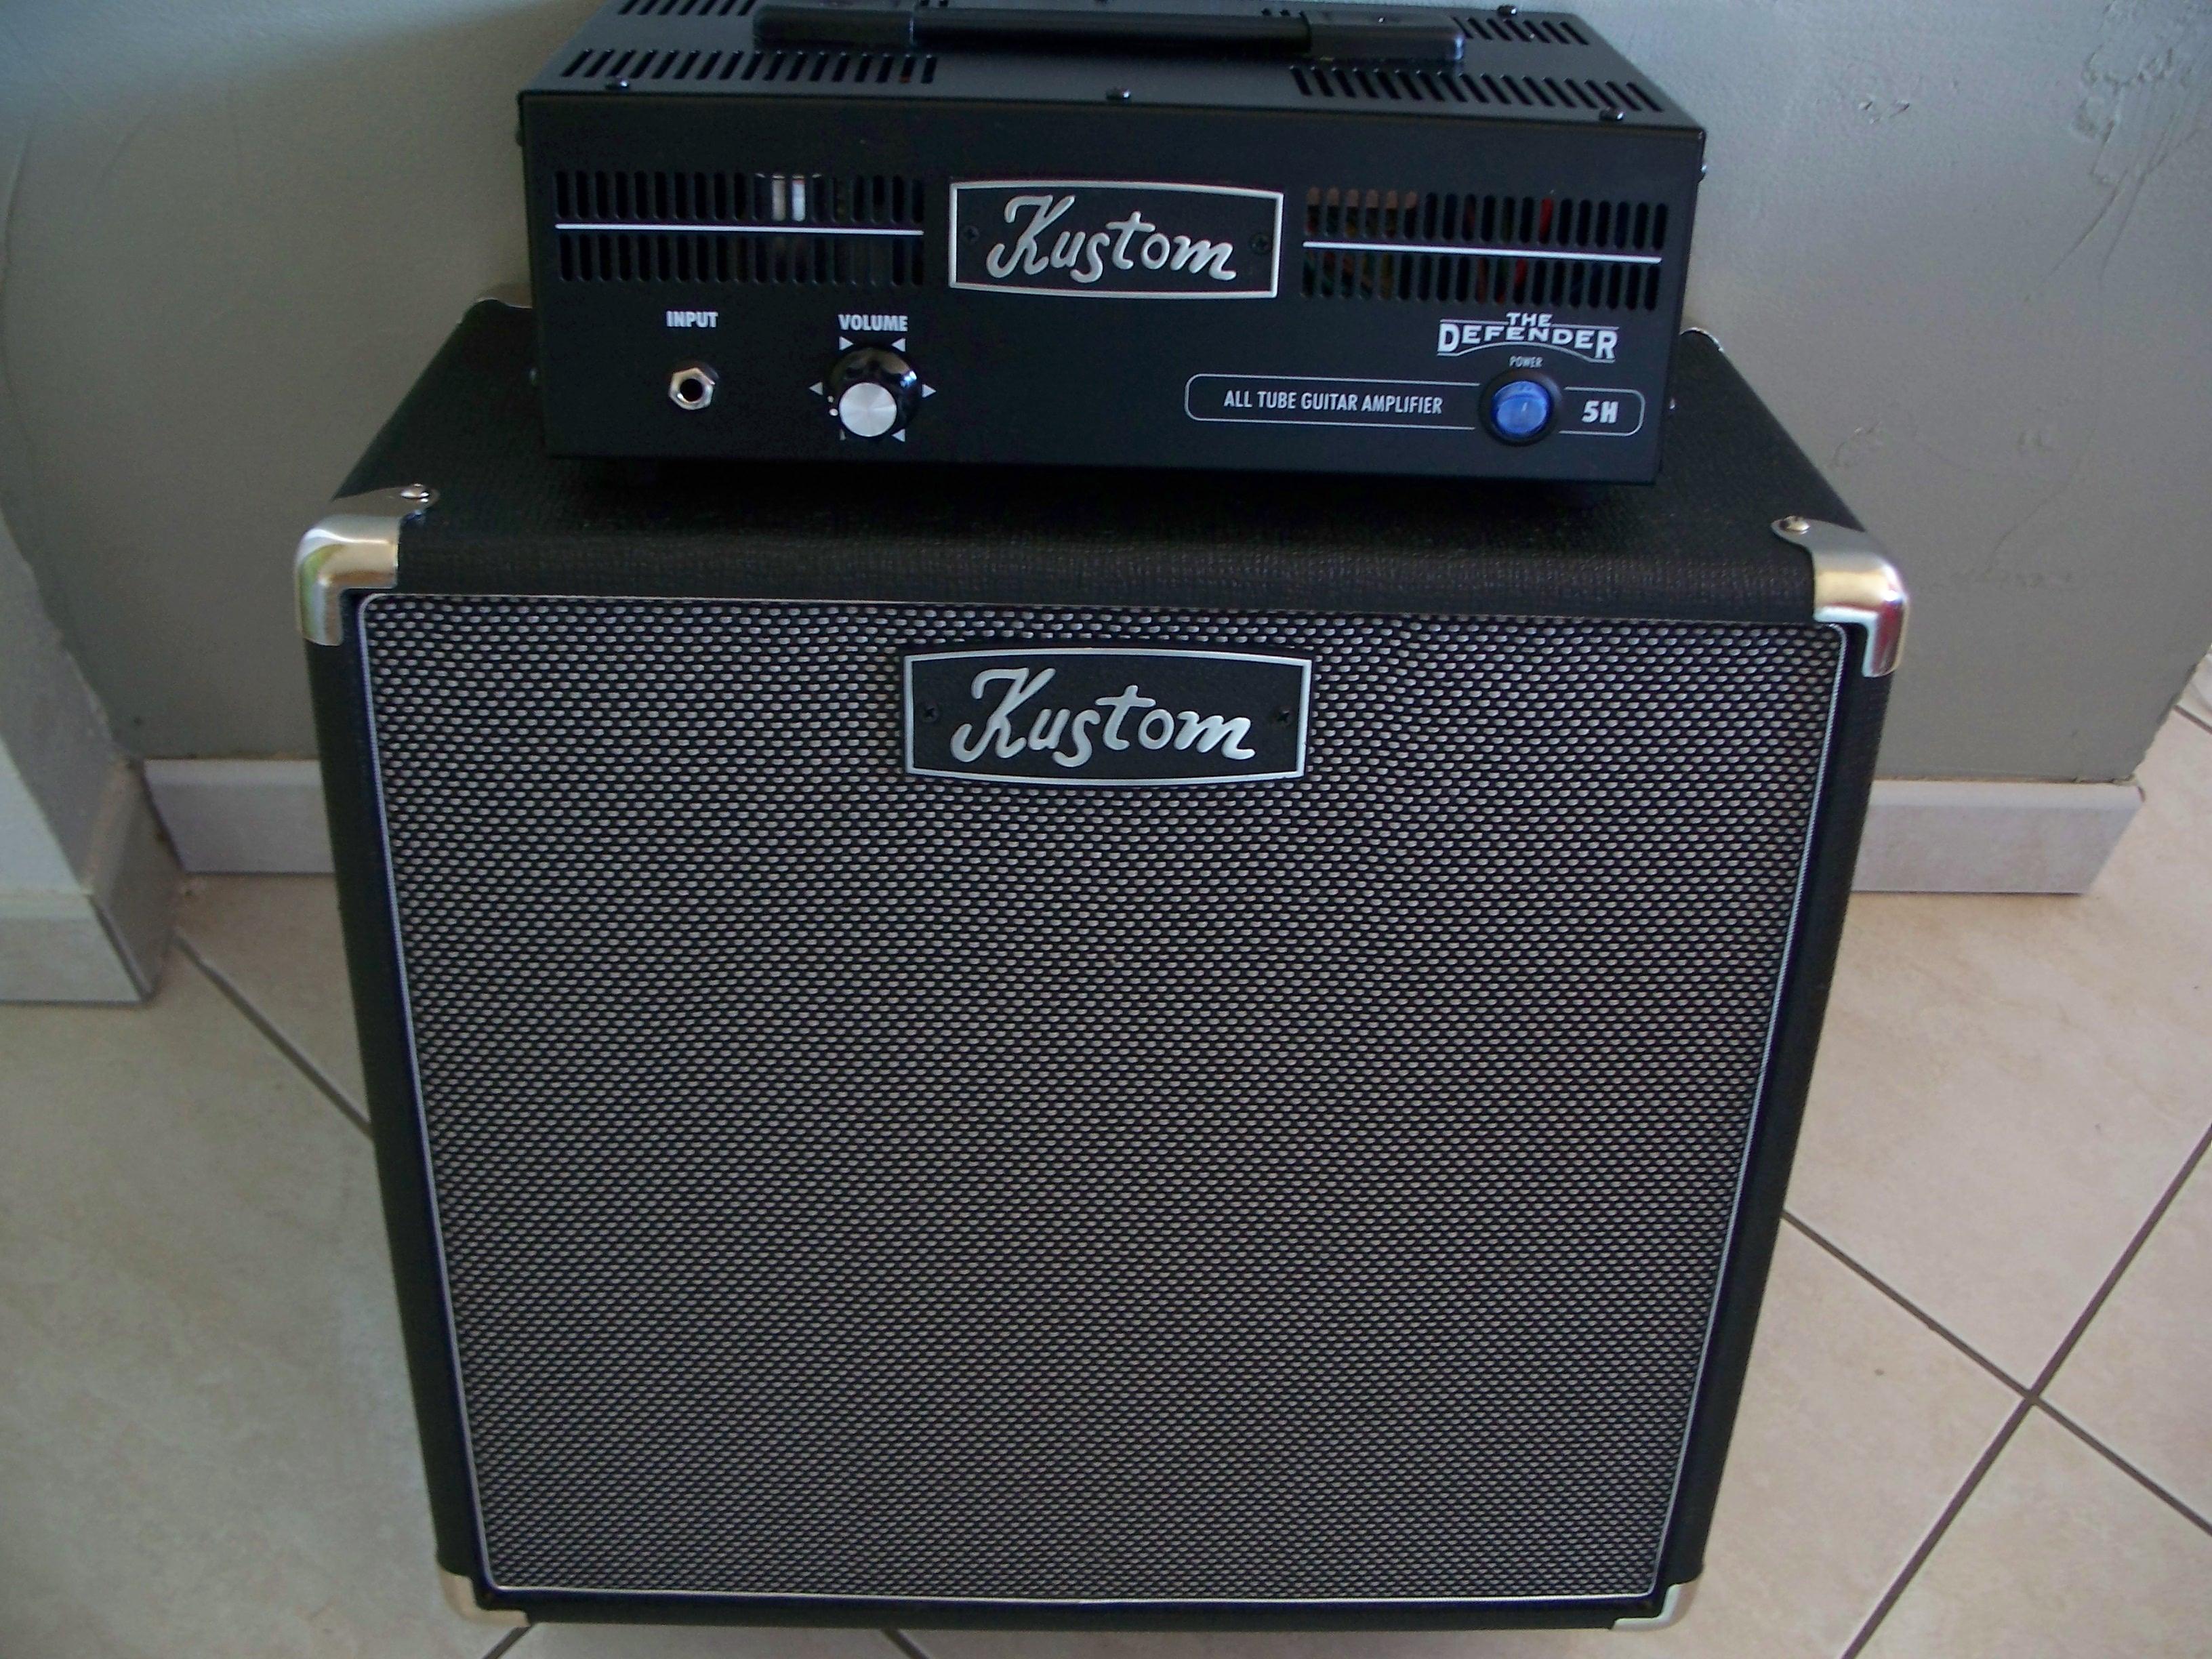 Kustom 1x12 Cabinet Kustom Defender 1x12 Image 1126615 Audiofanzine